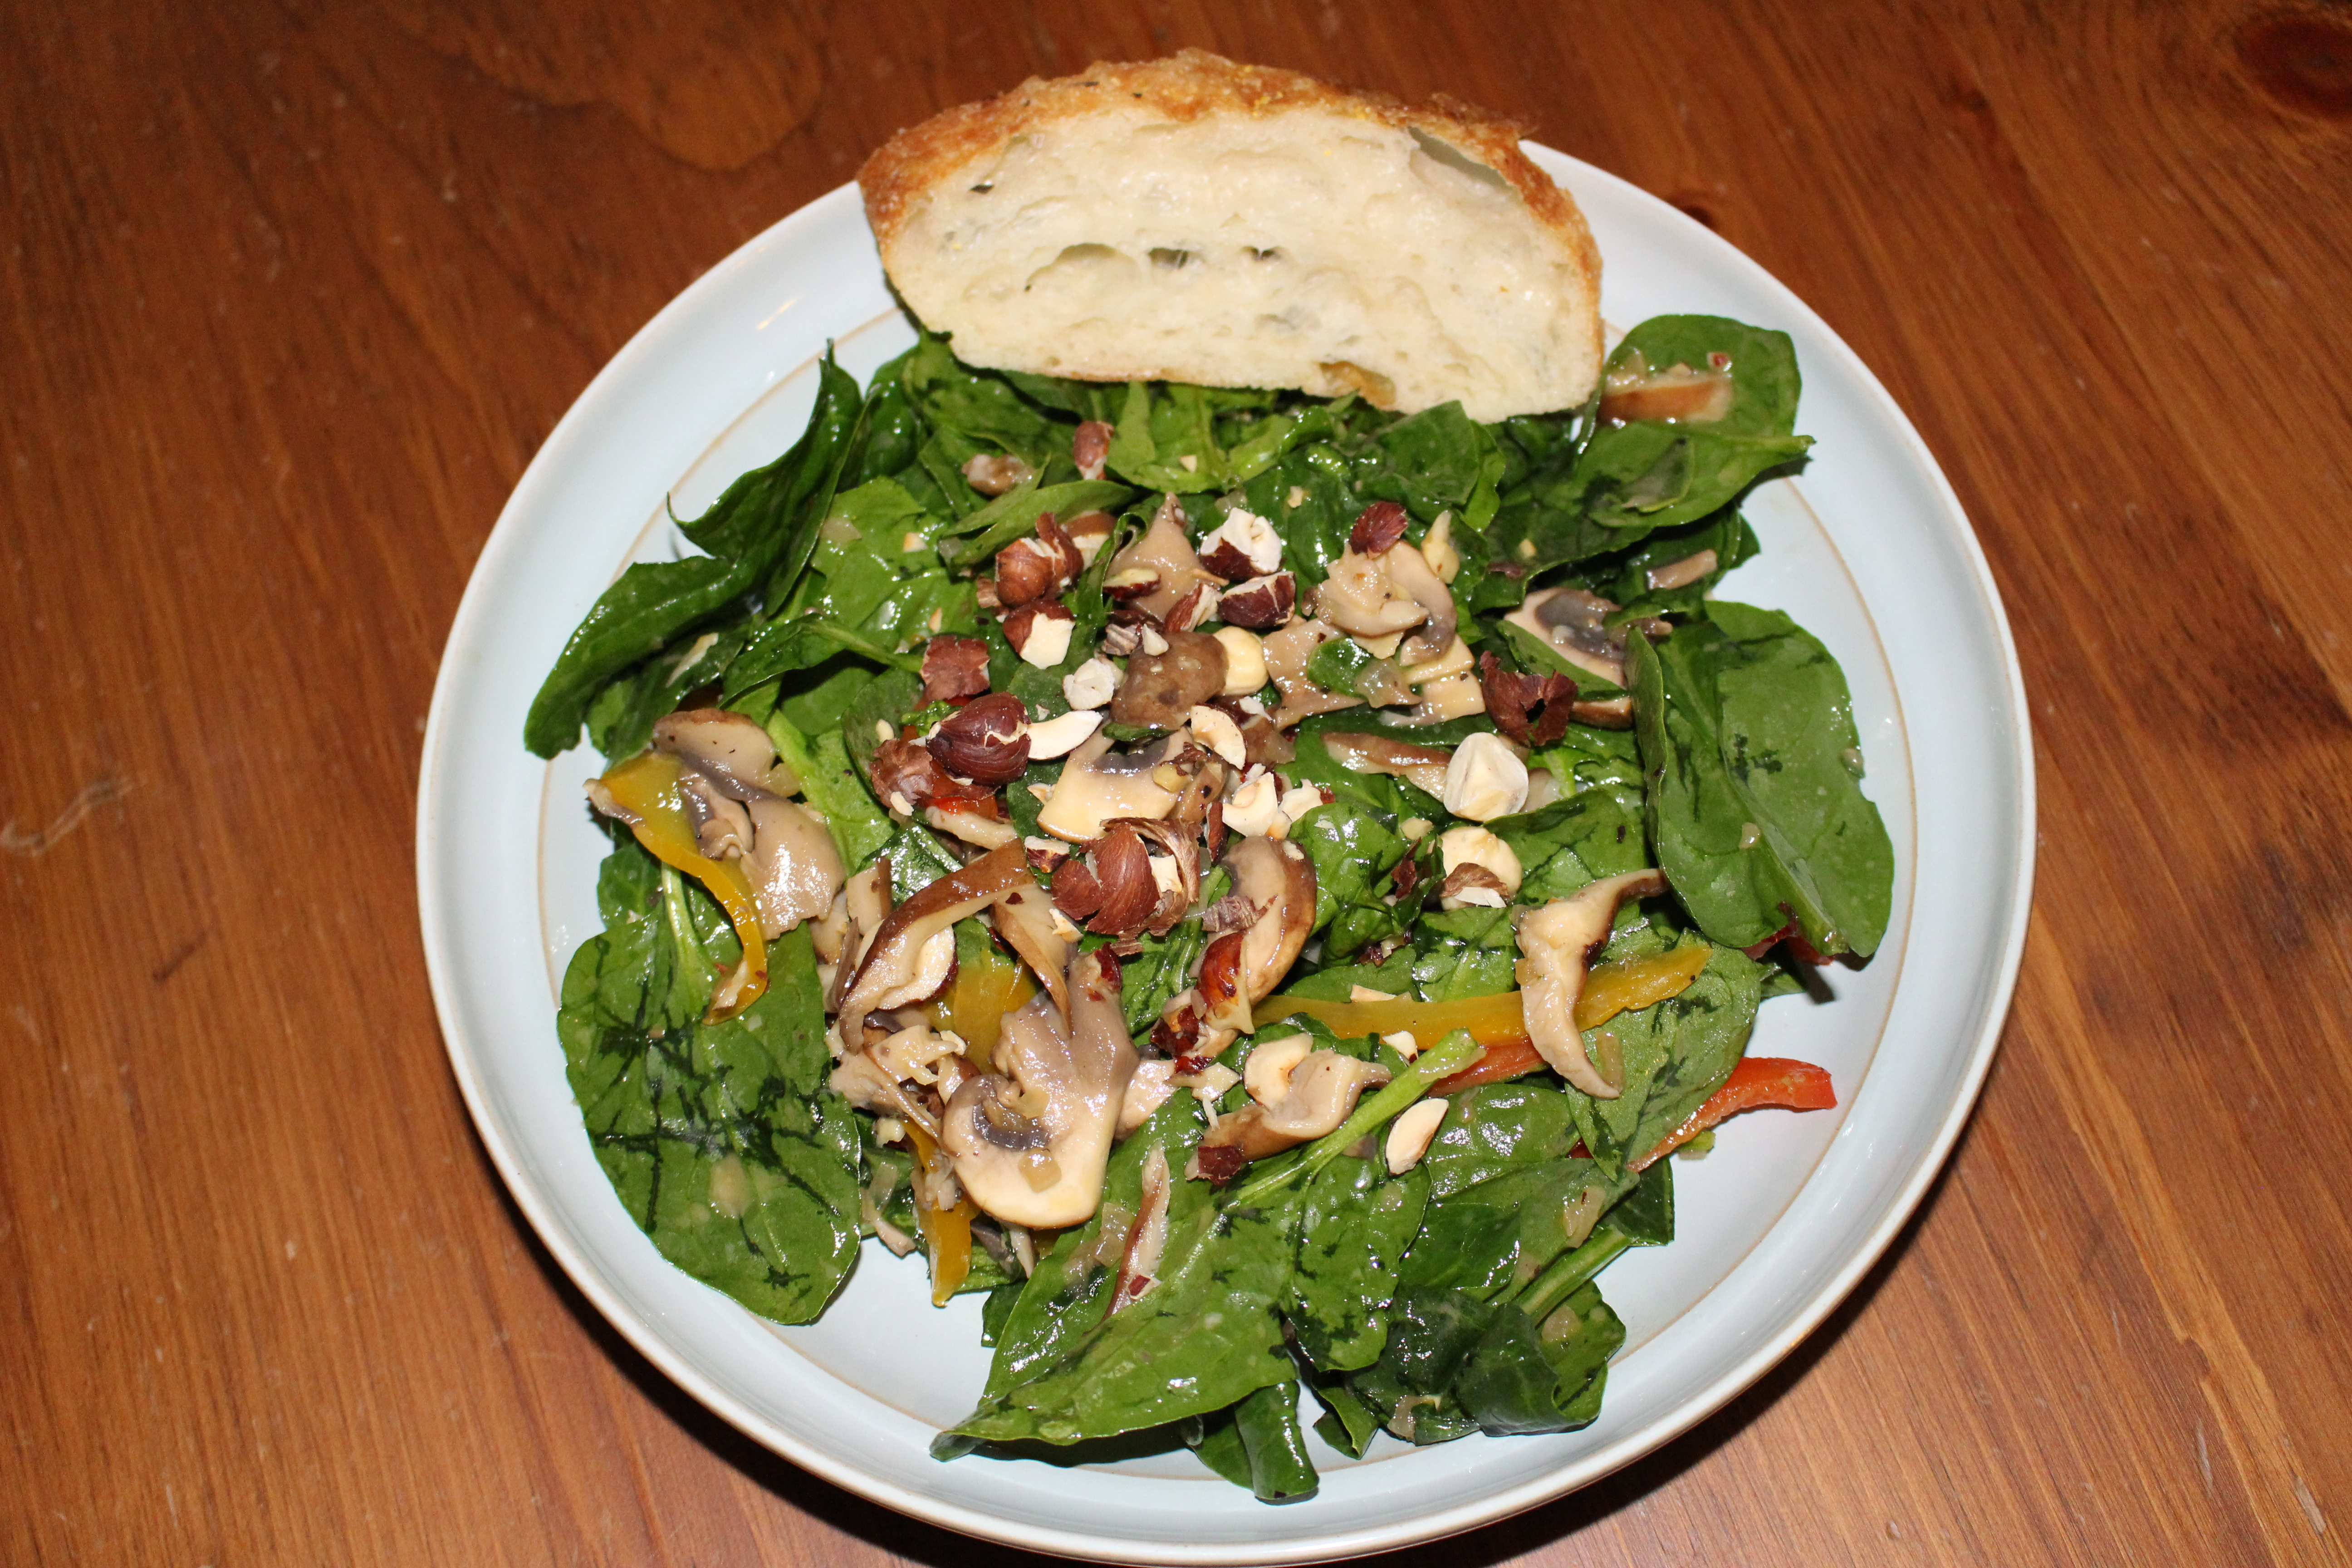 ... salad warm bacon potato salad warm mushroom salad with hazelnuts